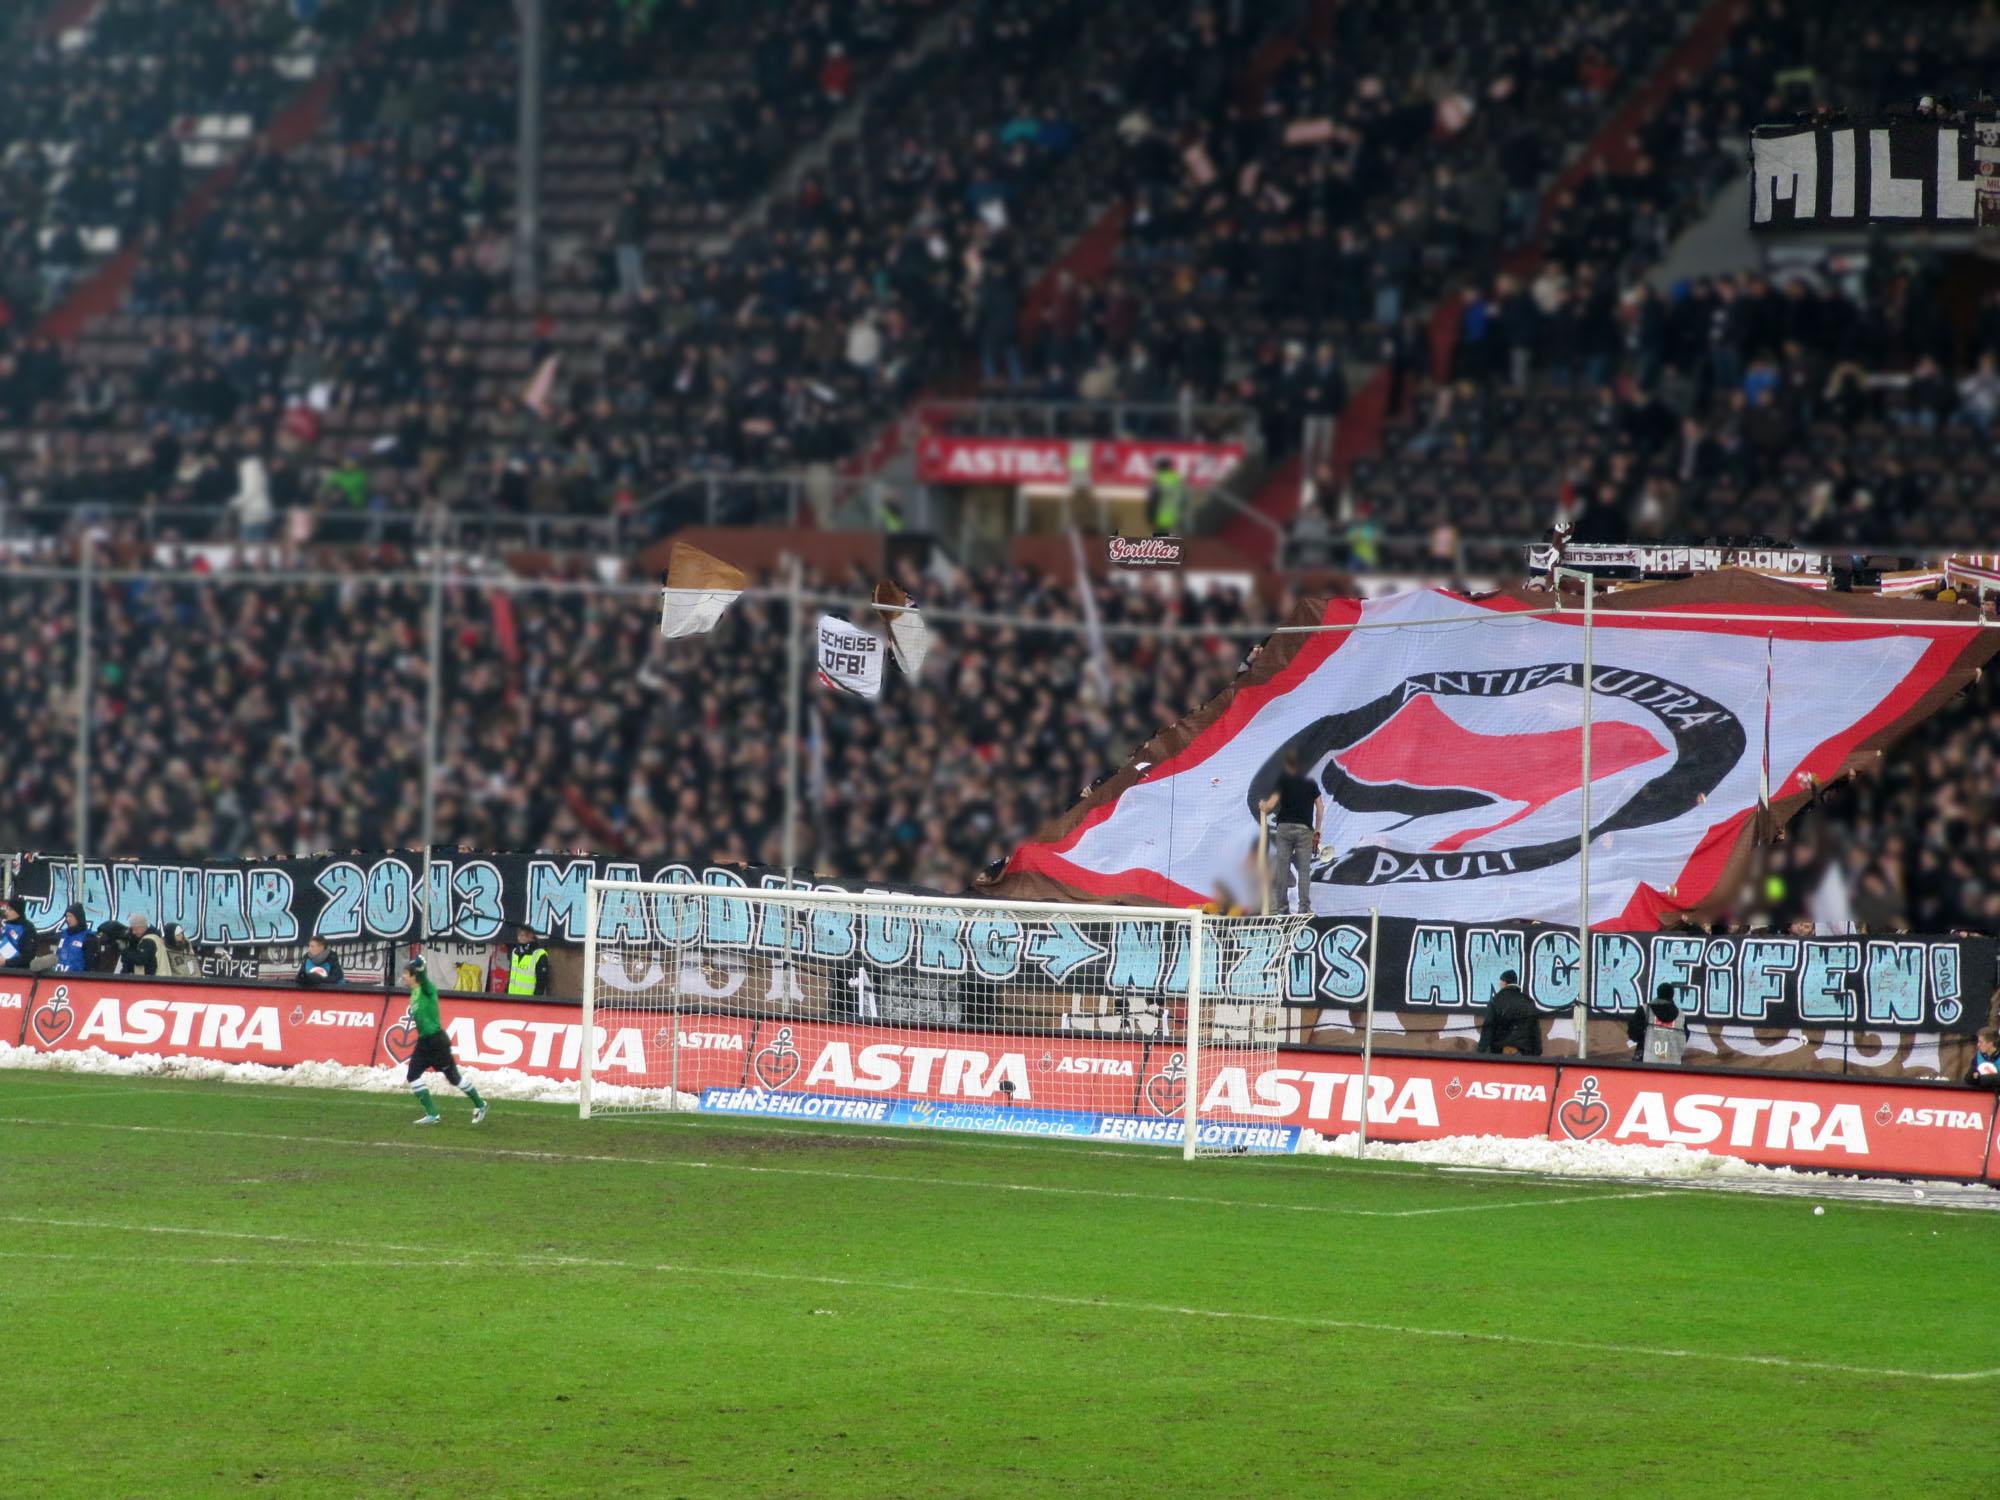 12. Januar 2013: Naziaufmarsch in Magdeburg verhindern!